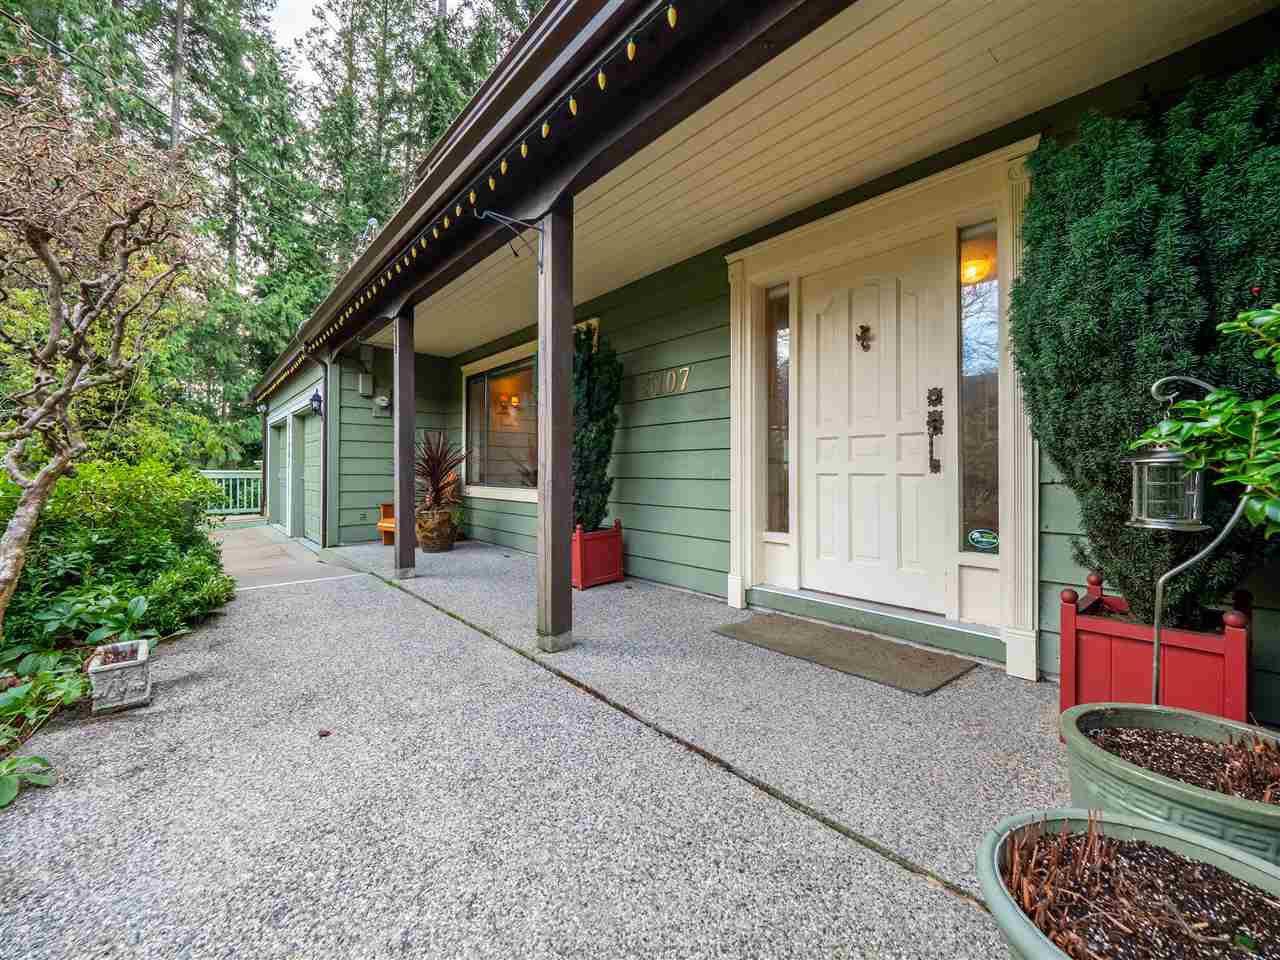 Photo 2: Photos: 5107 RADCLIFFE Road in Sechelt: Sechelt District House for sale (Sunshine Coast)  : MLS®# R2425277